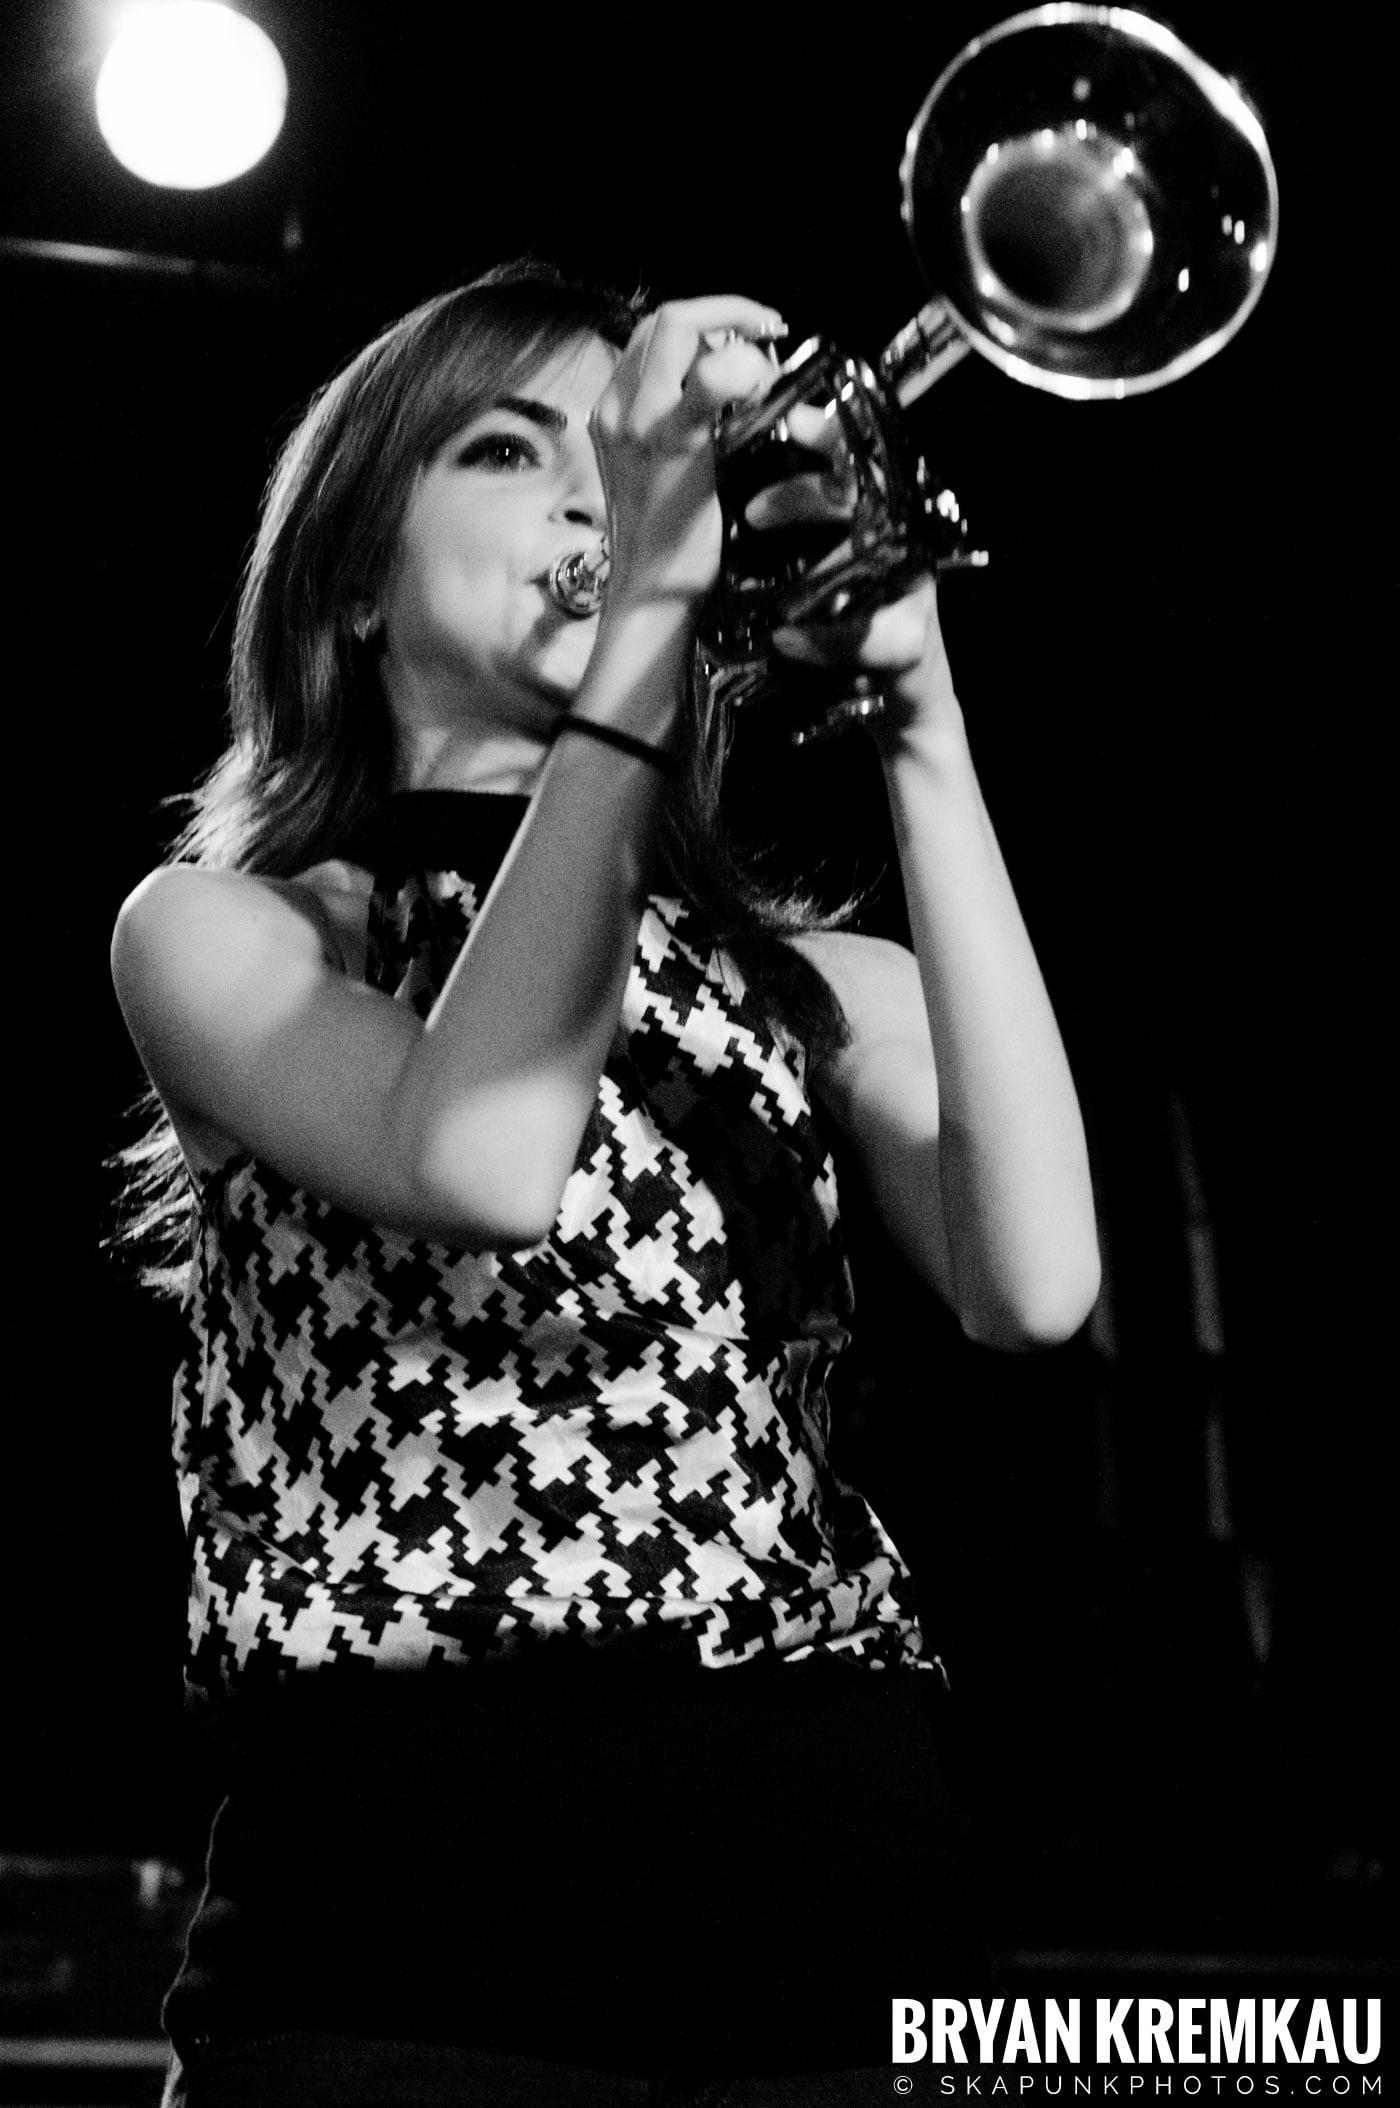 Avon Junkies (Ska is Dead Tour) @ Starland Ballroom, Sayreville, NJ - 11.15.09 (8)